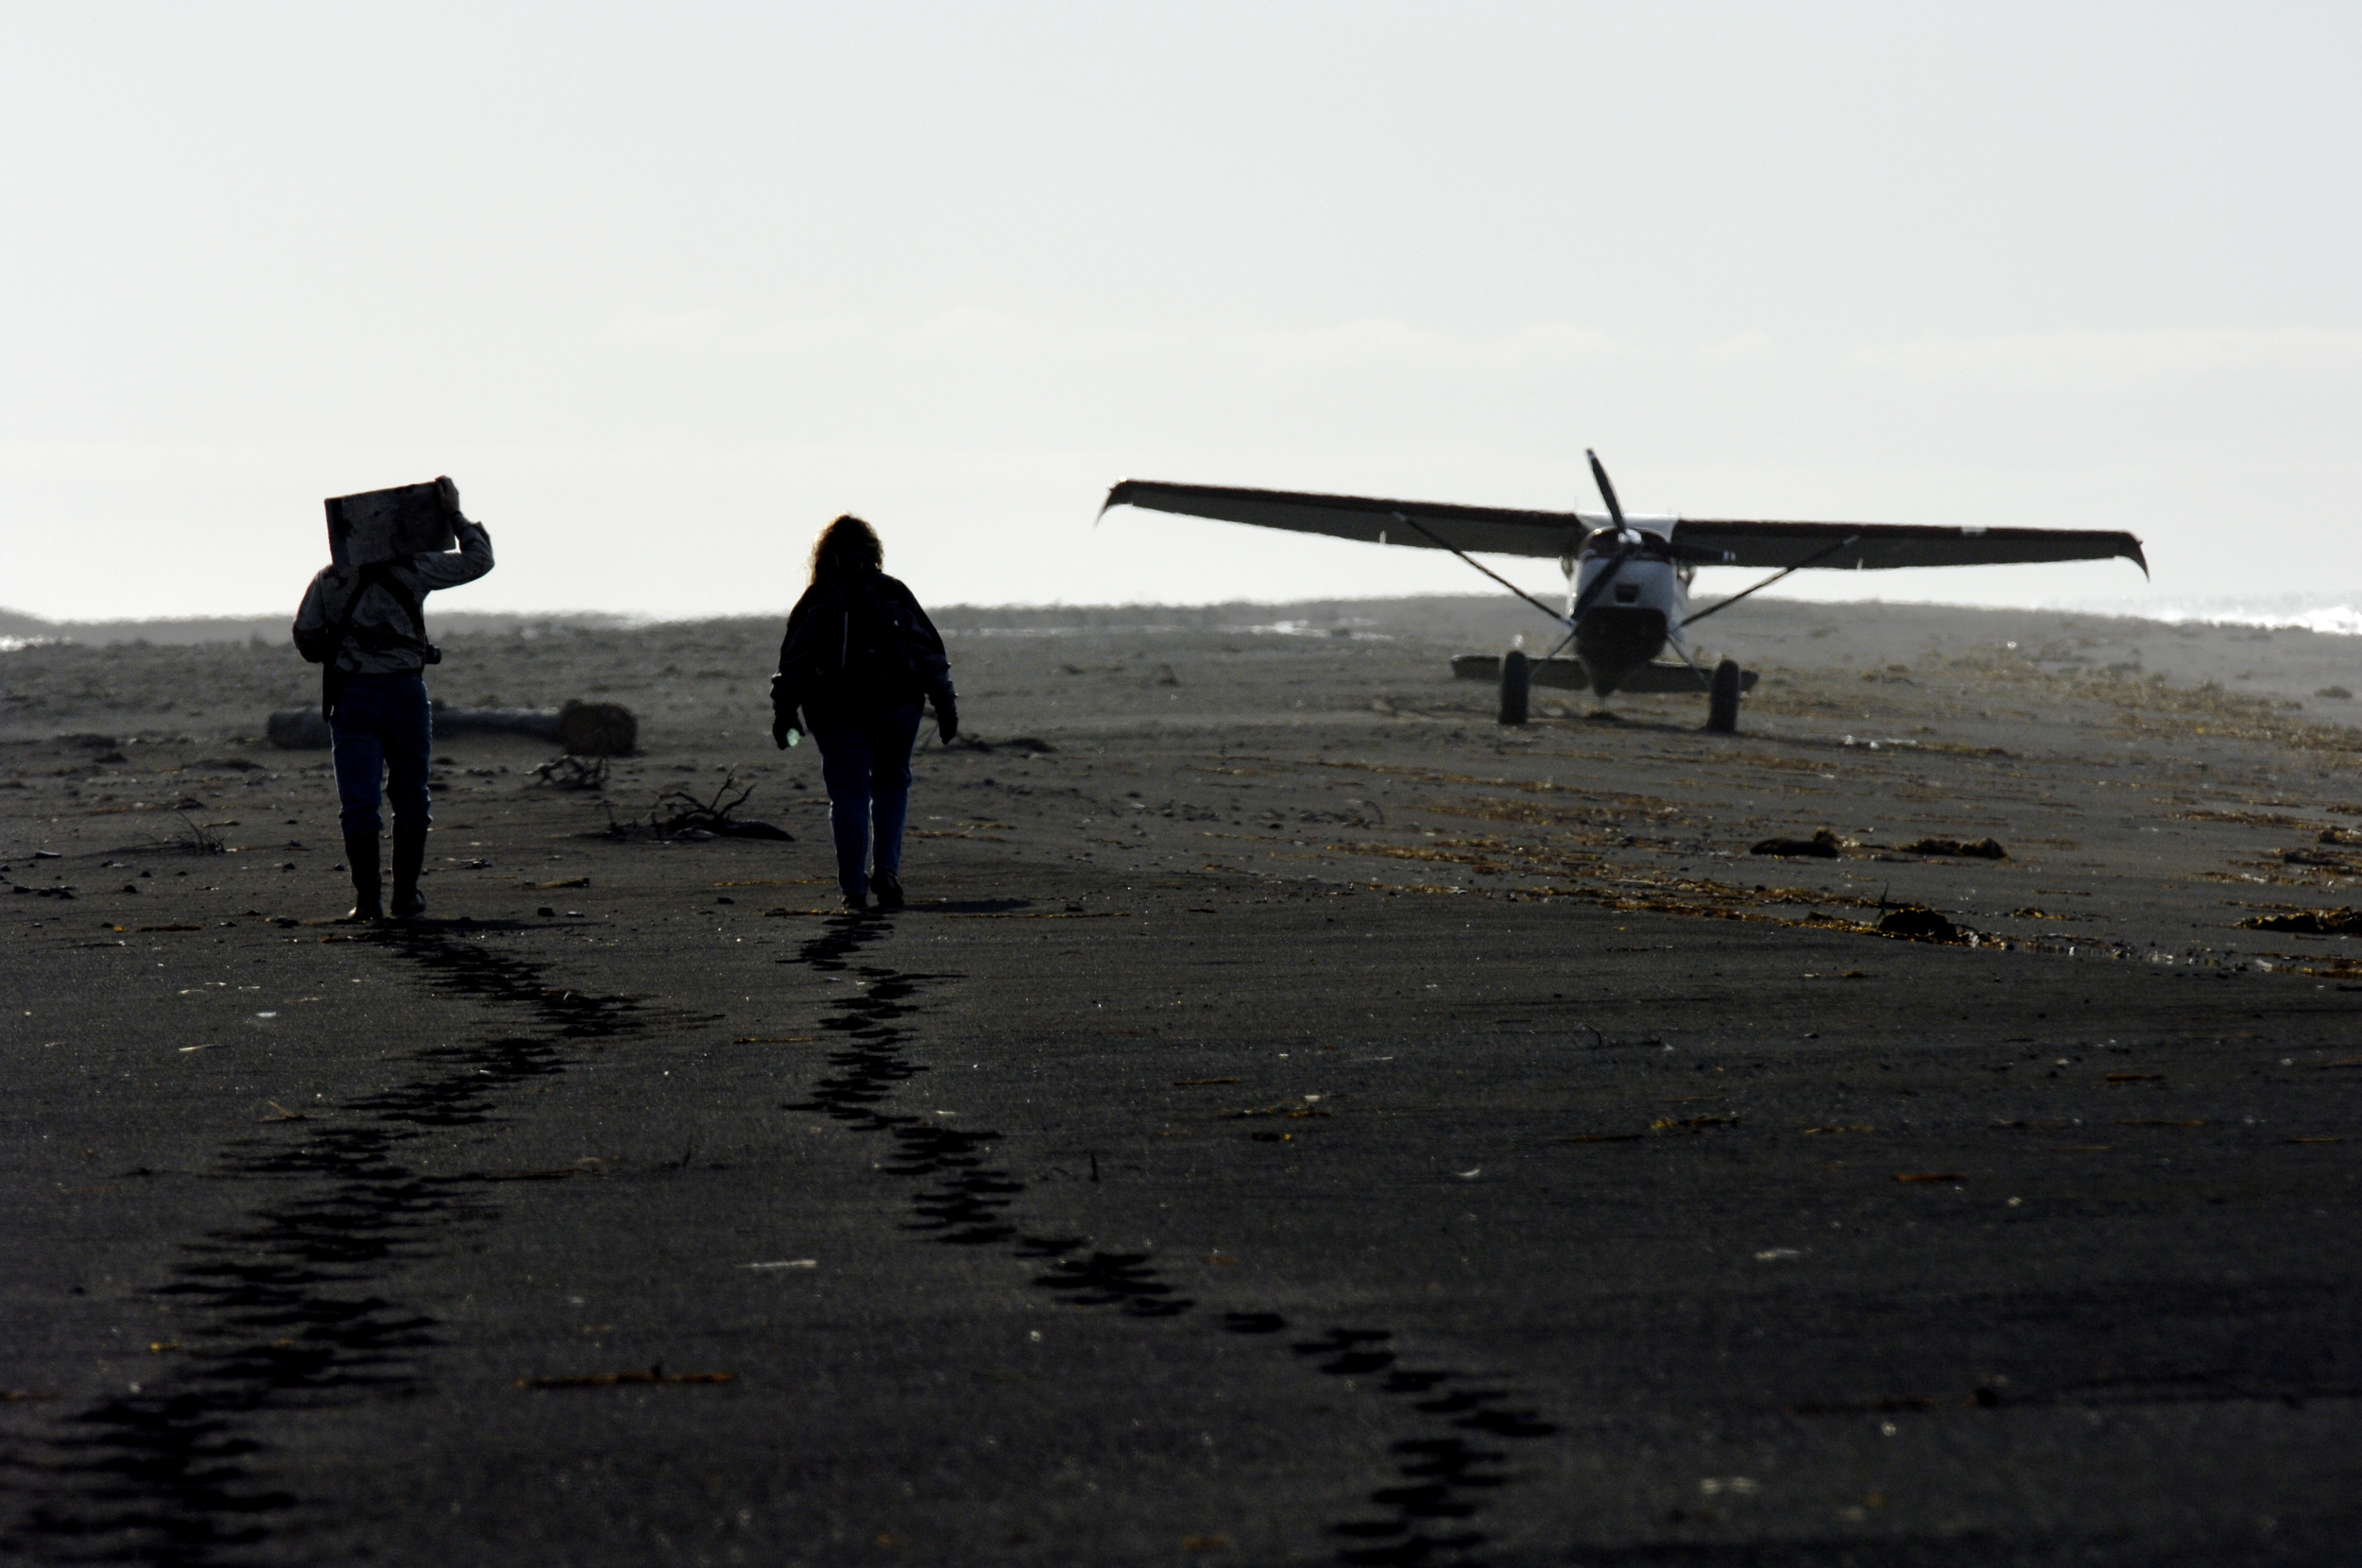 Bush plane on beach